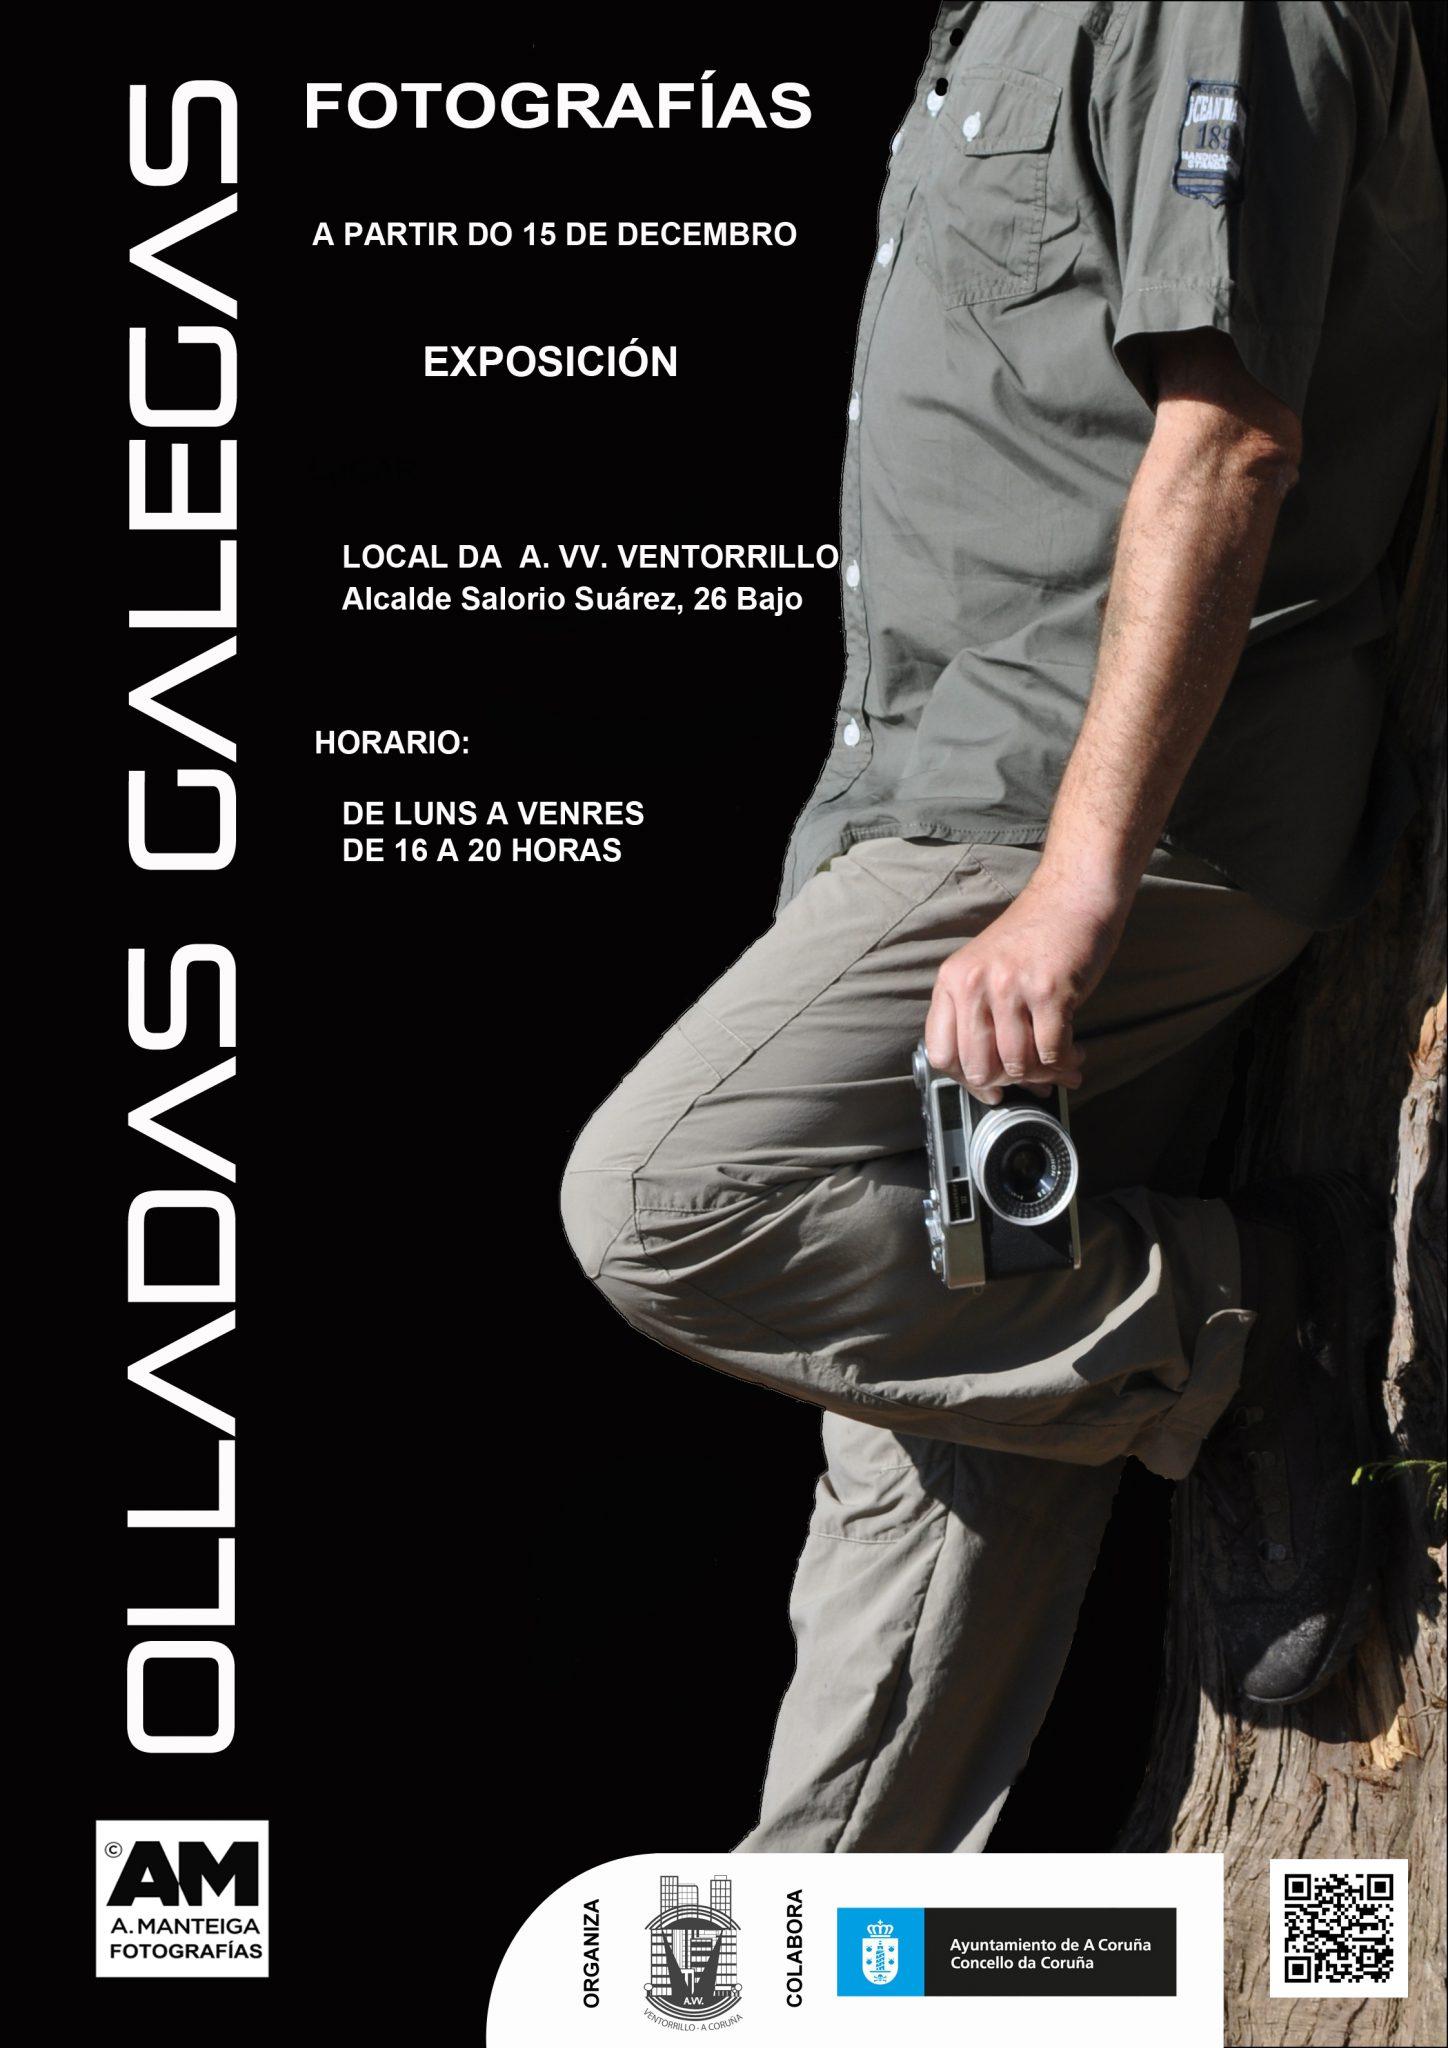 EXPOSICION FOTOGRAFICA OLLADAS GALEGAS